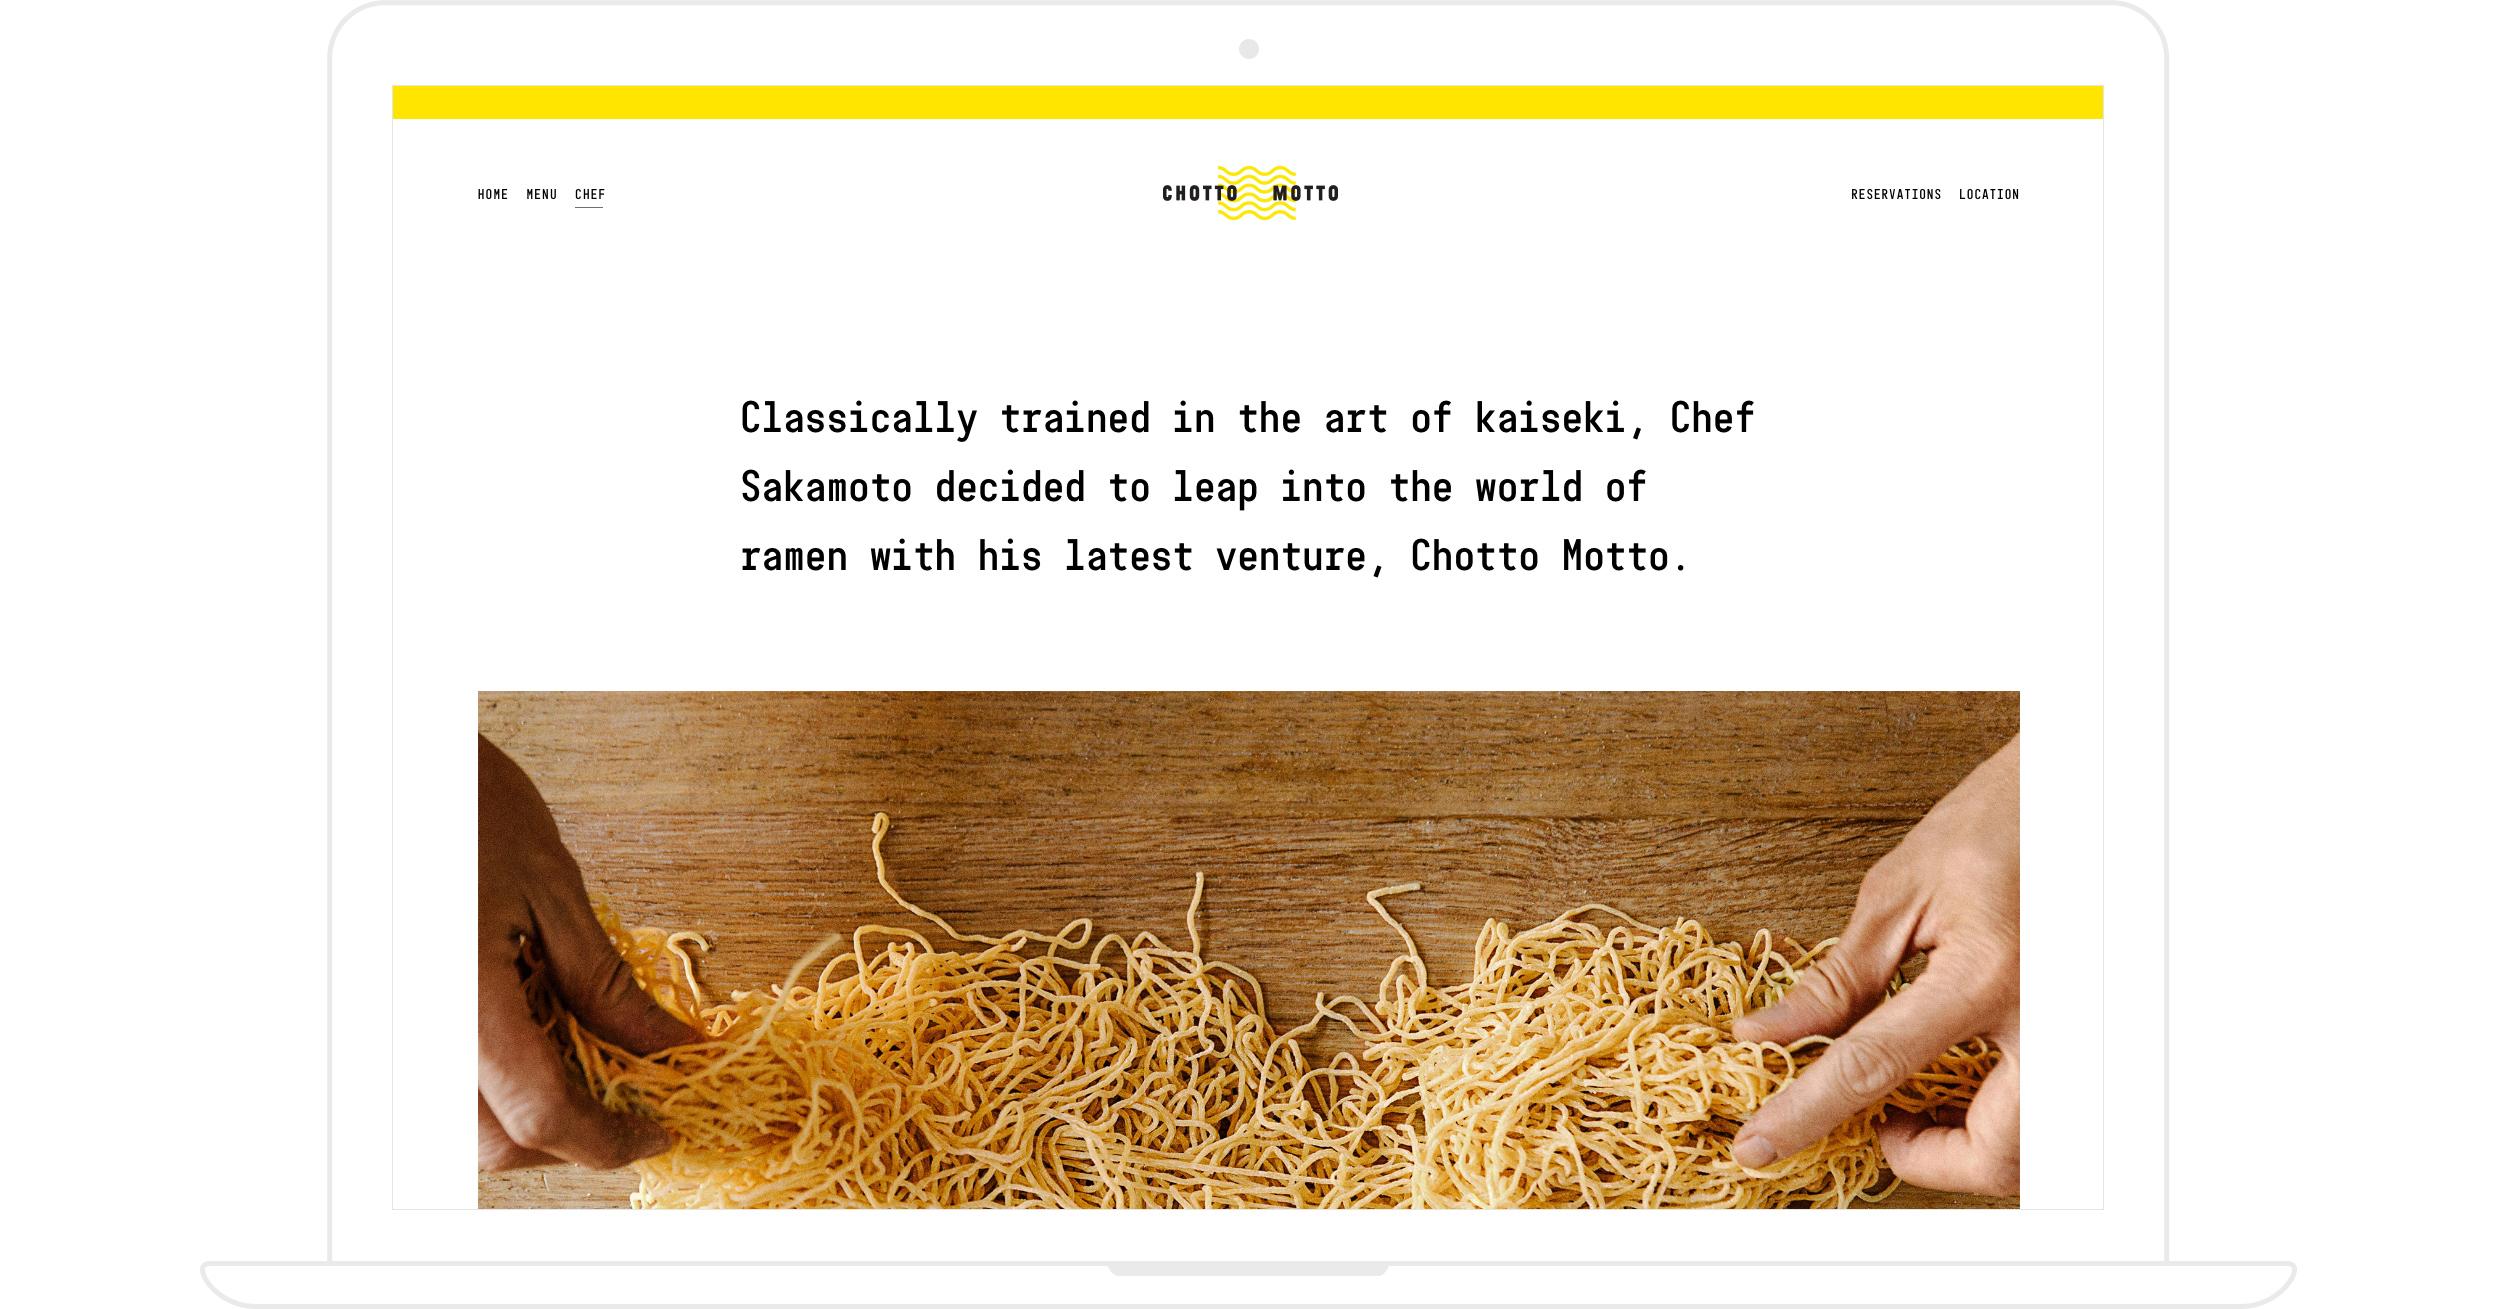 chotto-motto-laptop-chef.jpg